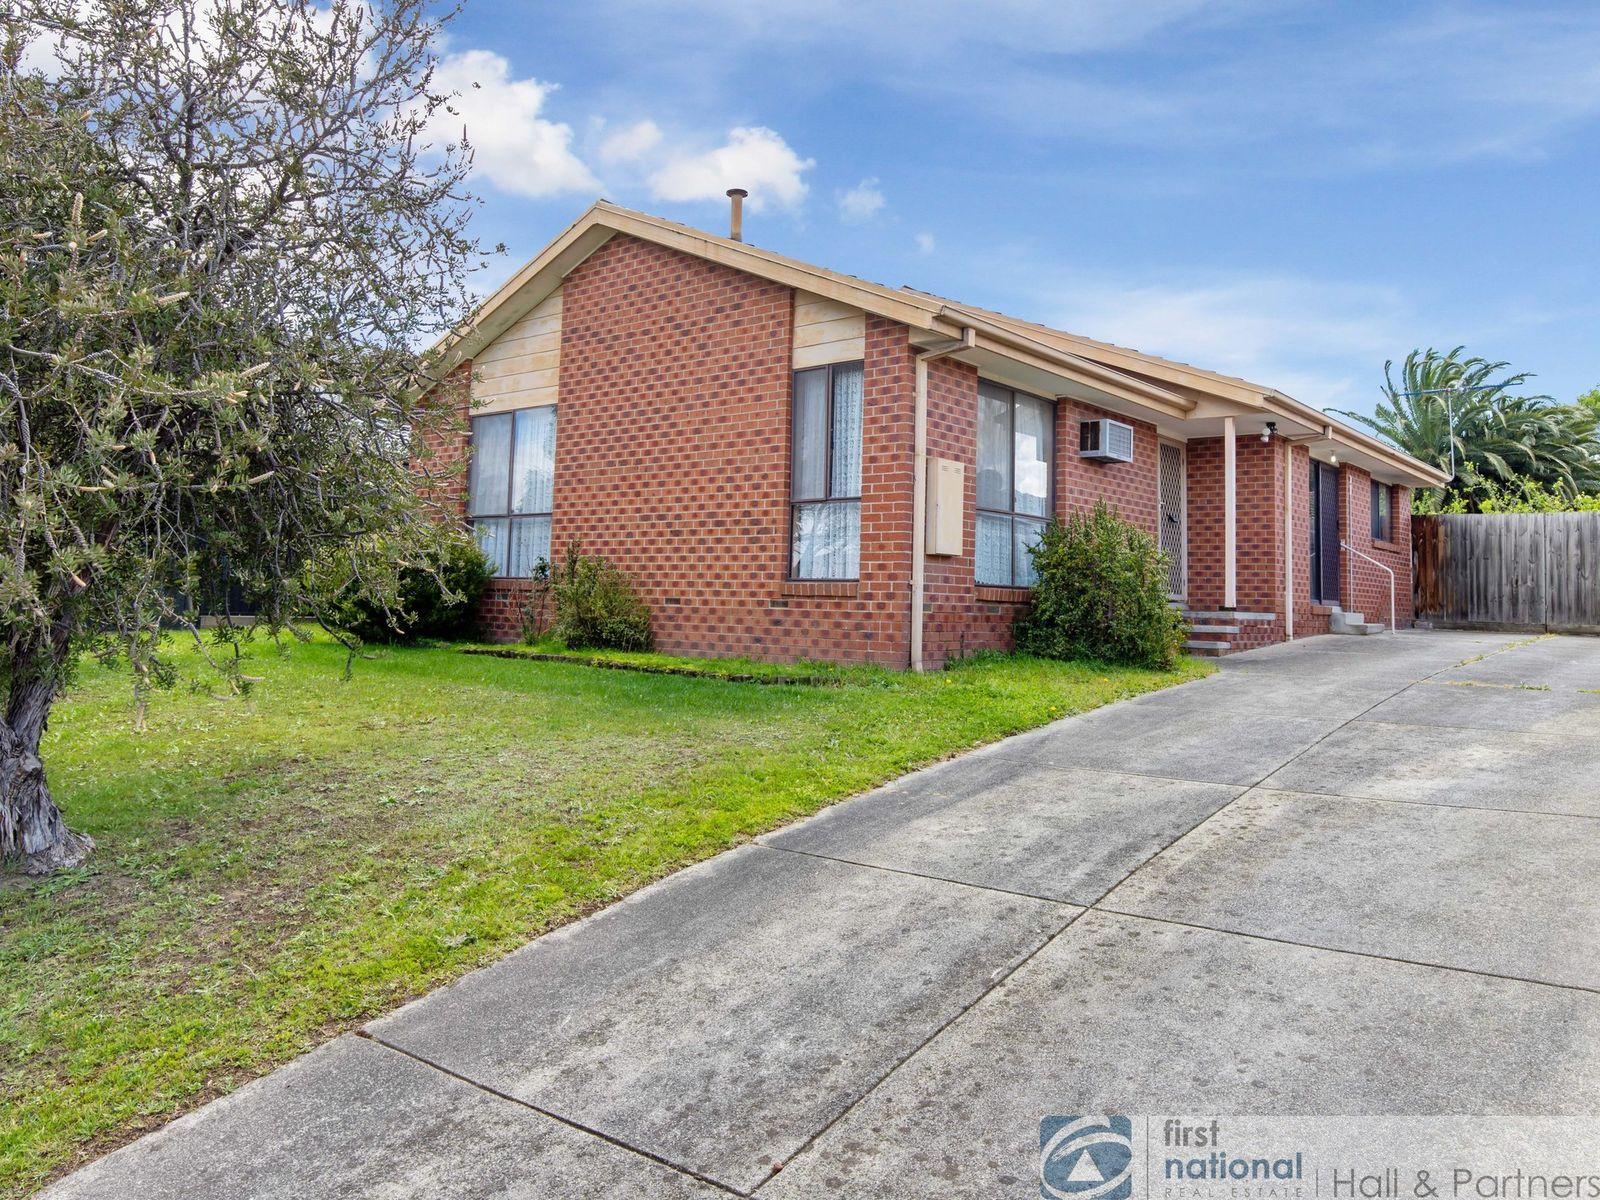 49 Thomas Mitchell Drive, Endeavour Hills, VIC 3802